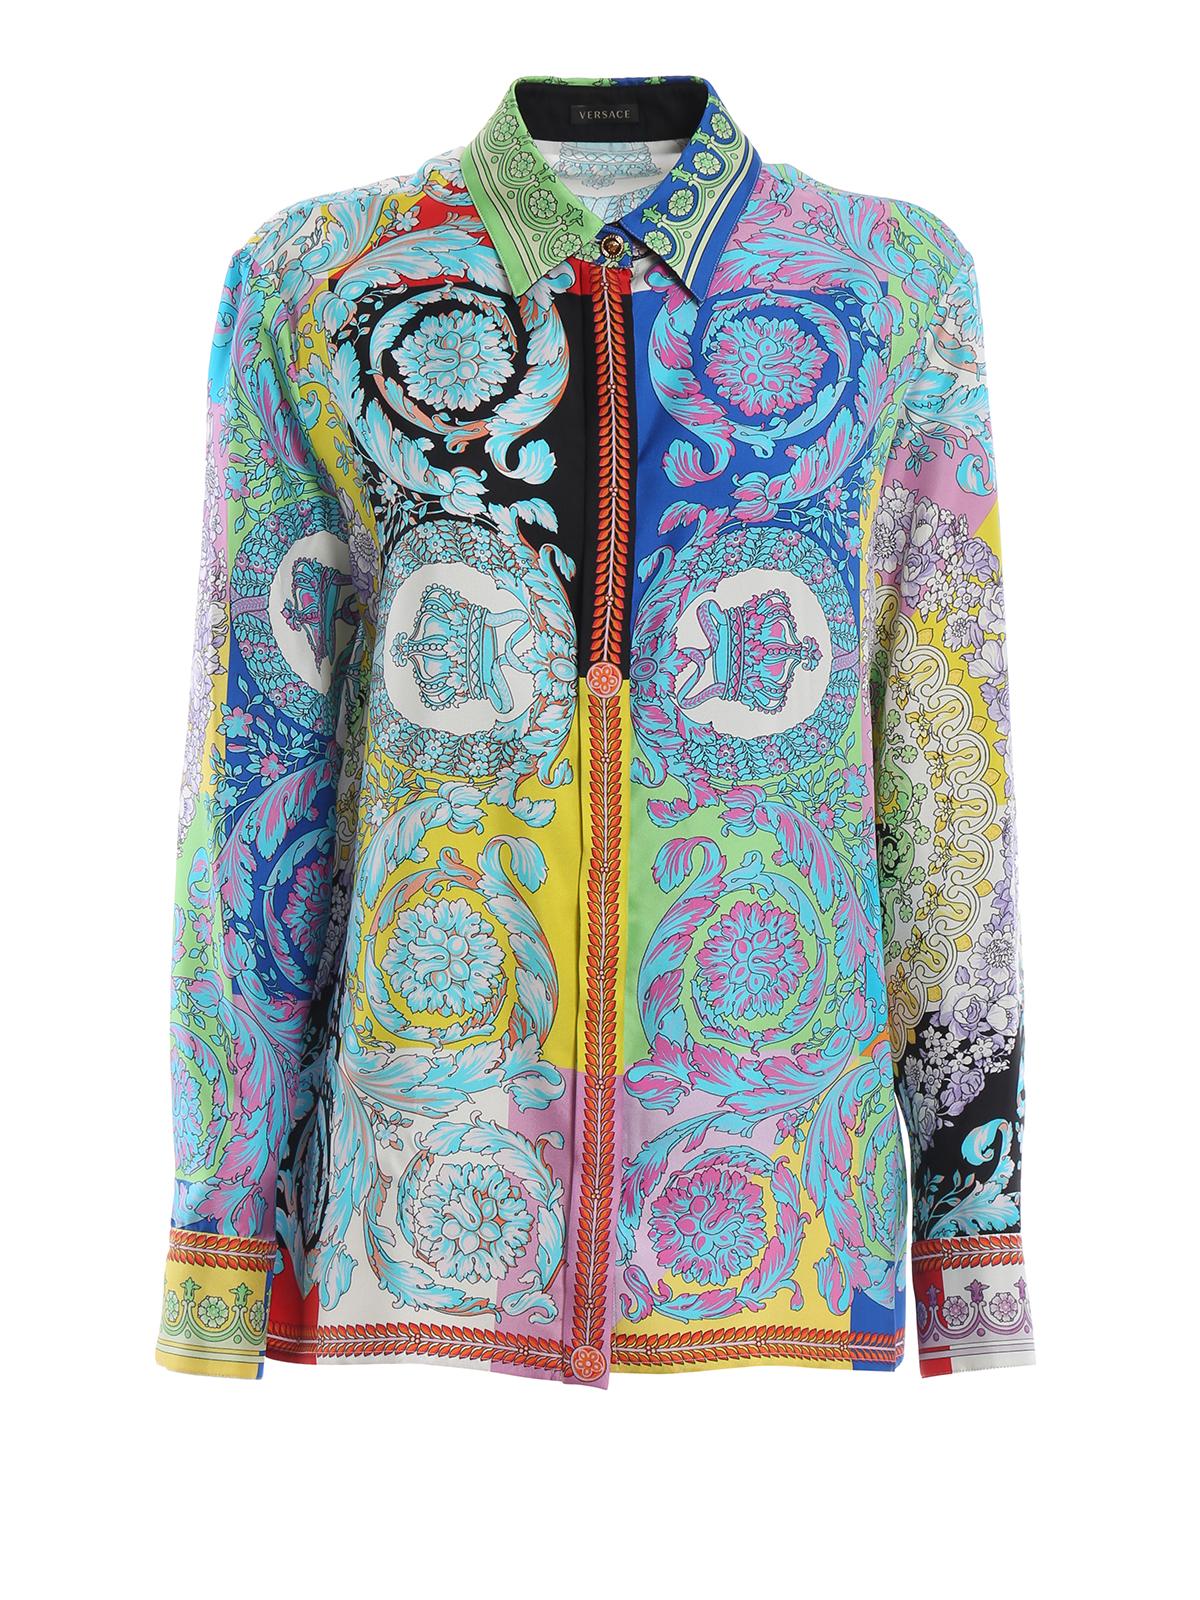 df7376fa1ee03c Versace - Multicolour baroque print silk shirt - shirts - A82662 ...